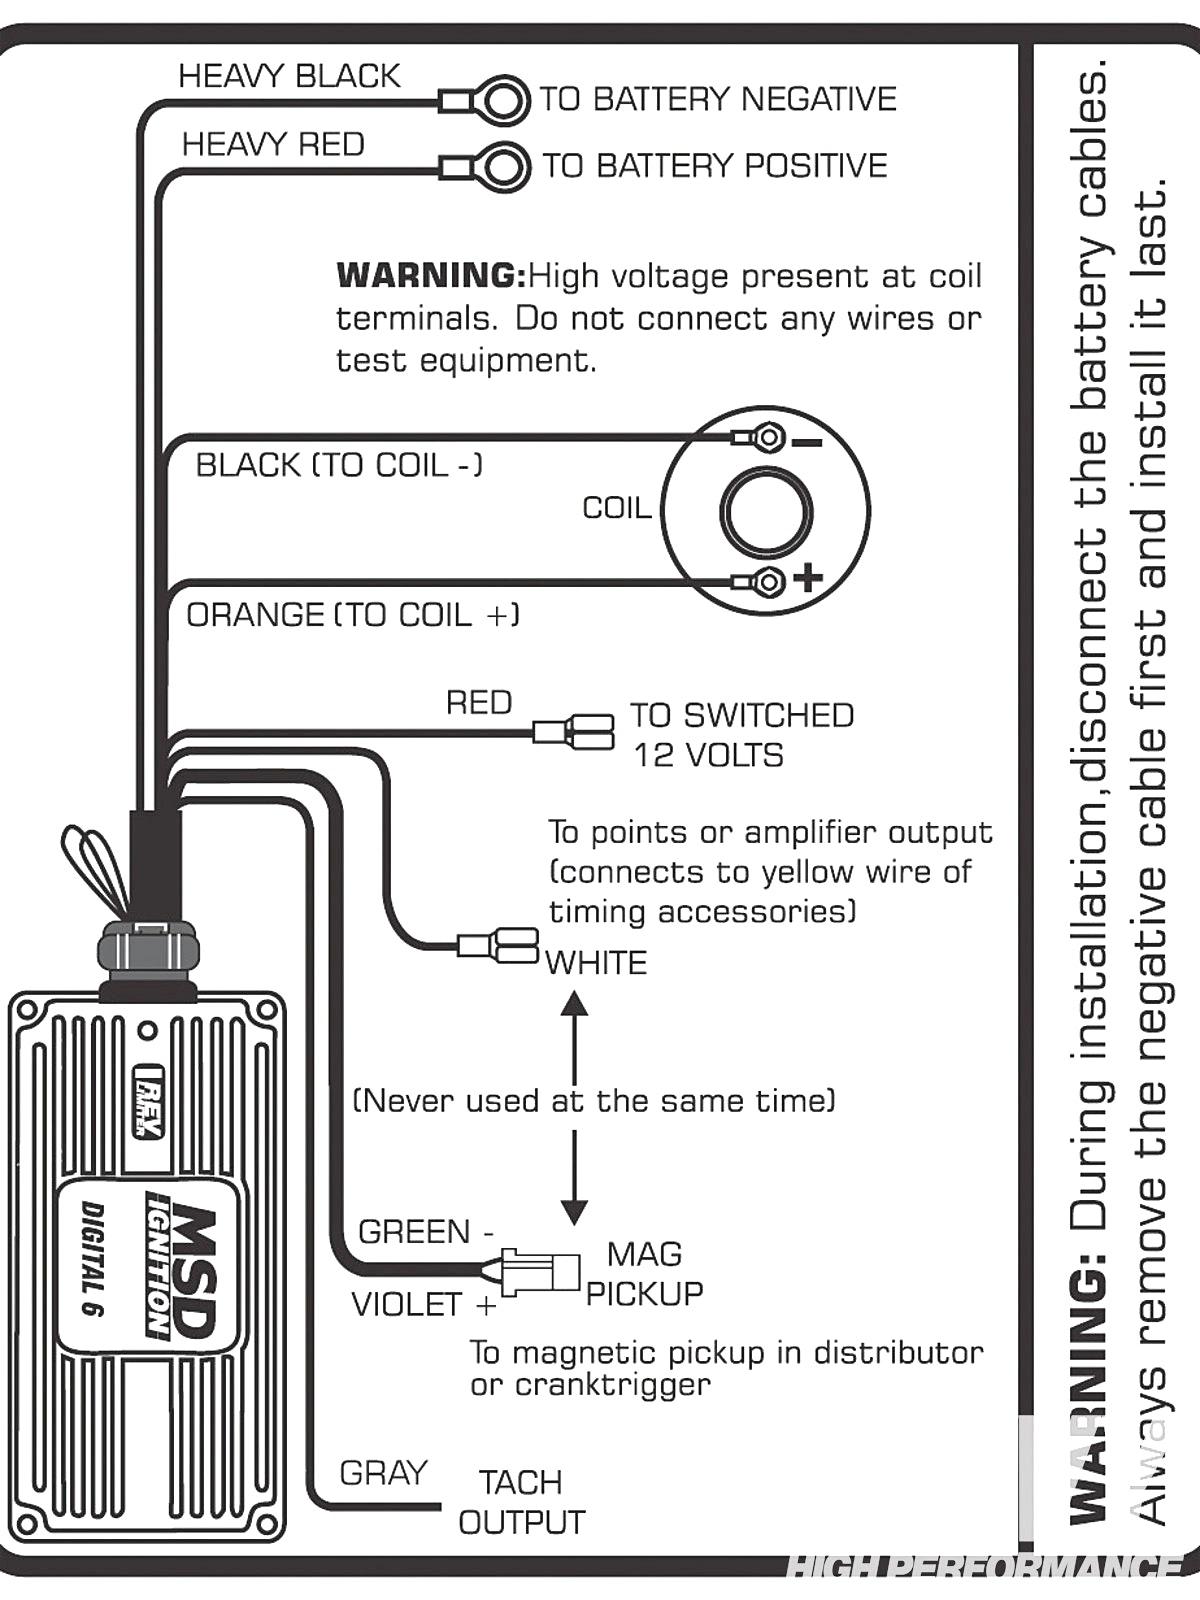 Mallory 6al Wiring Diagram | Wiring Diagram on msd 6al 2 wiring diagram, msd 6al box wiring diagram, distributor hei wiring diagram, msd 6al tach wiring diagram,